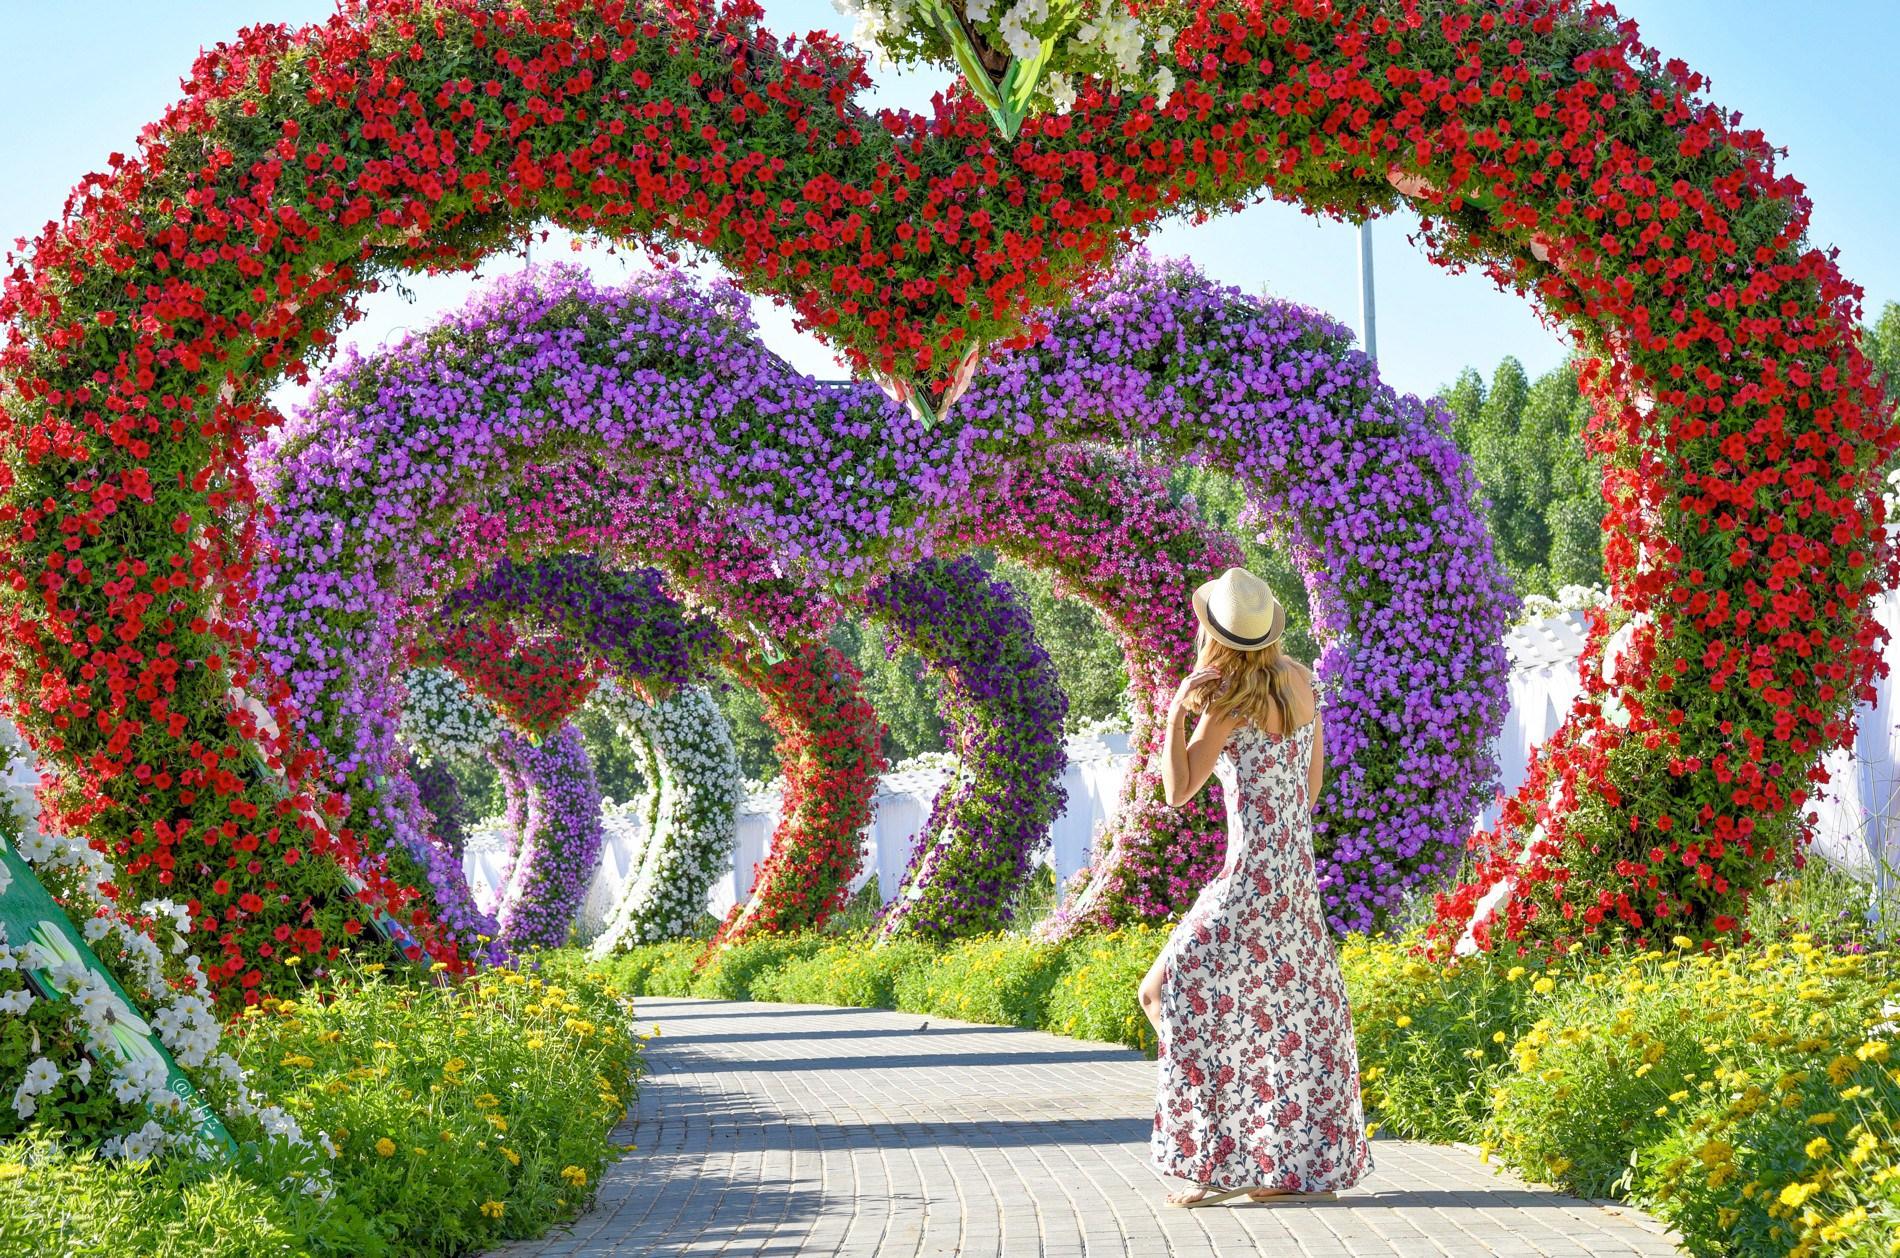 miraclegarden - میراکل گاردن دبی ، امارات | Dubai